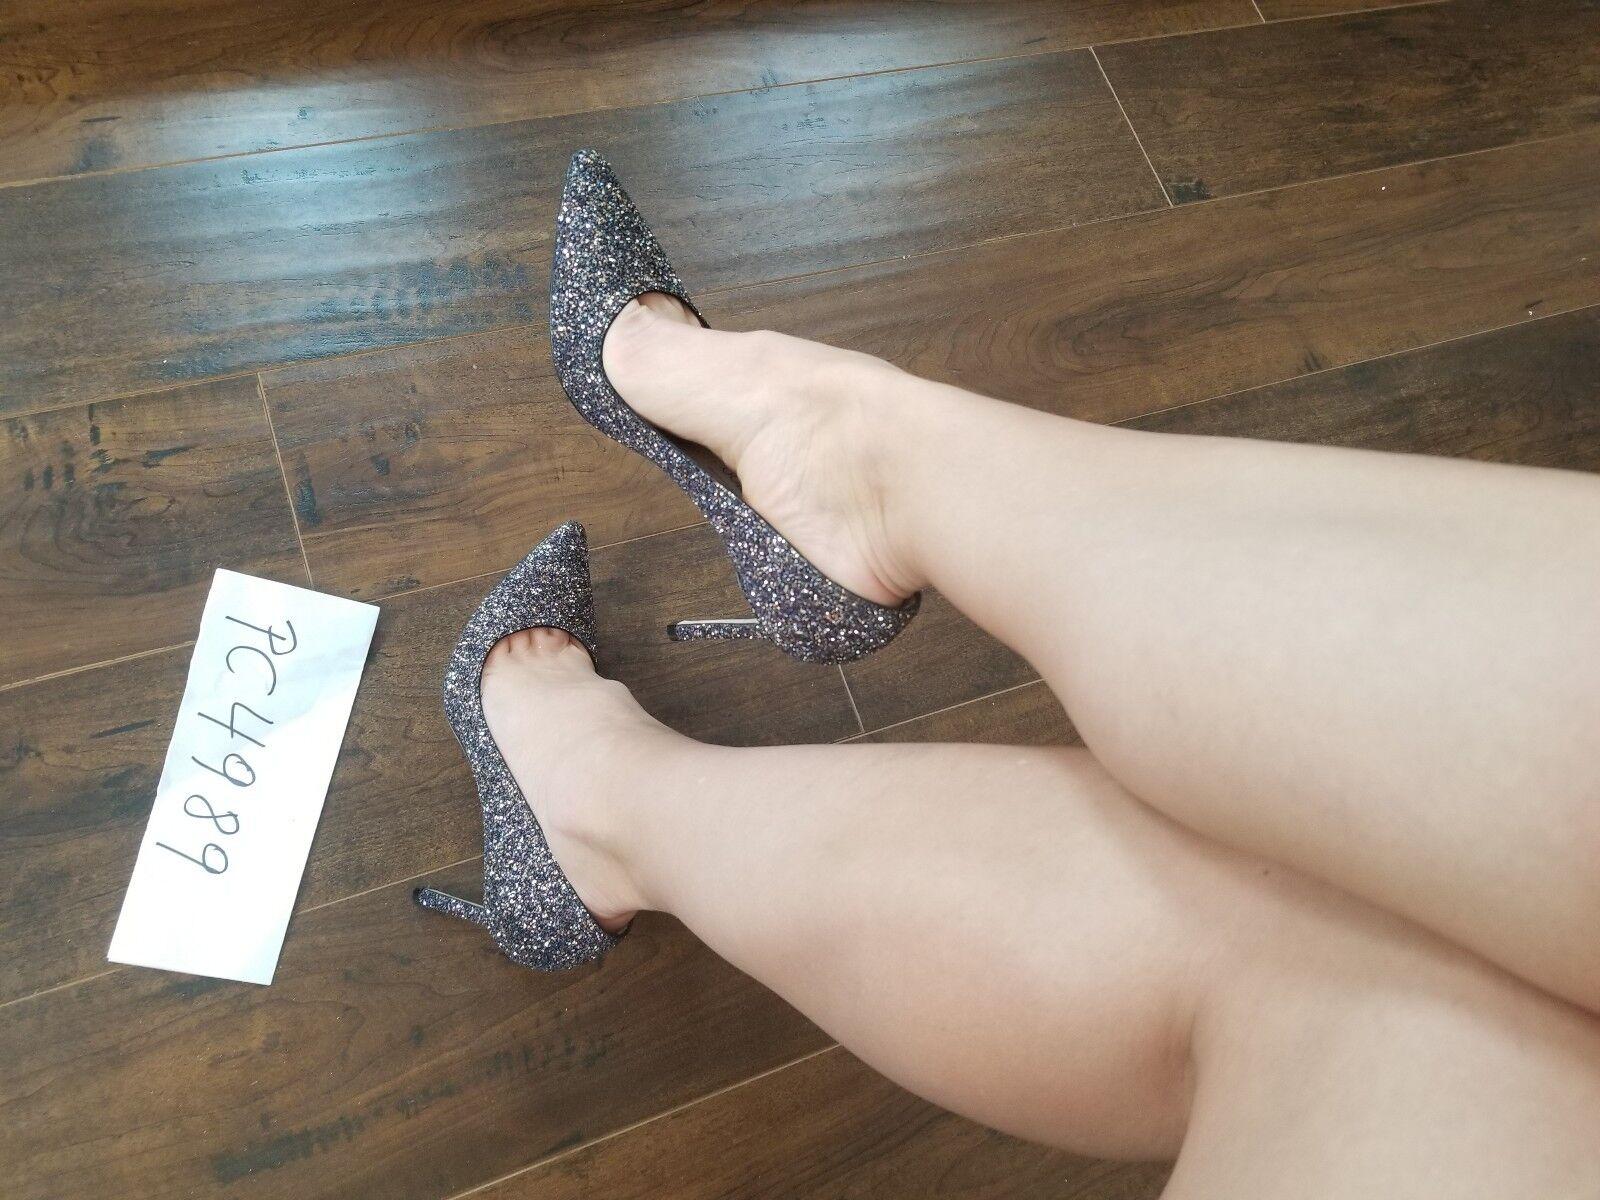 NWT Jimmy Choo ROMY Twilight Glitzy Heels Pumps Größe Größe Größe 39 US 8.5 9 receipt 9c0026